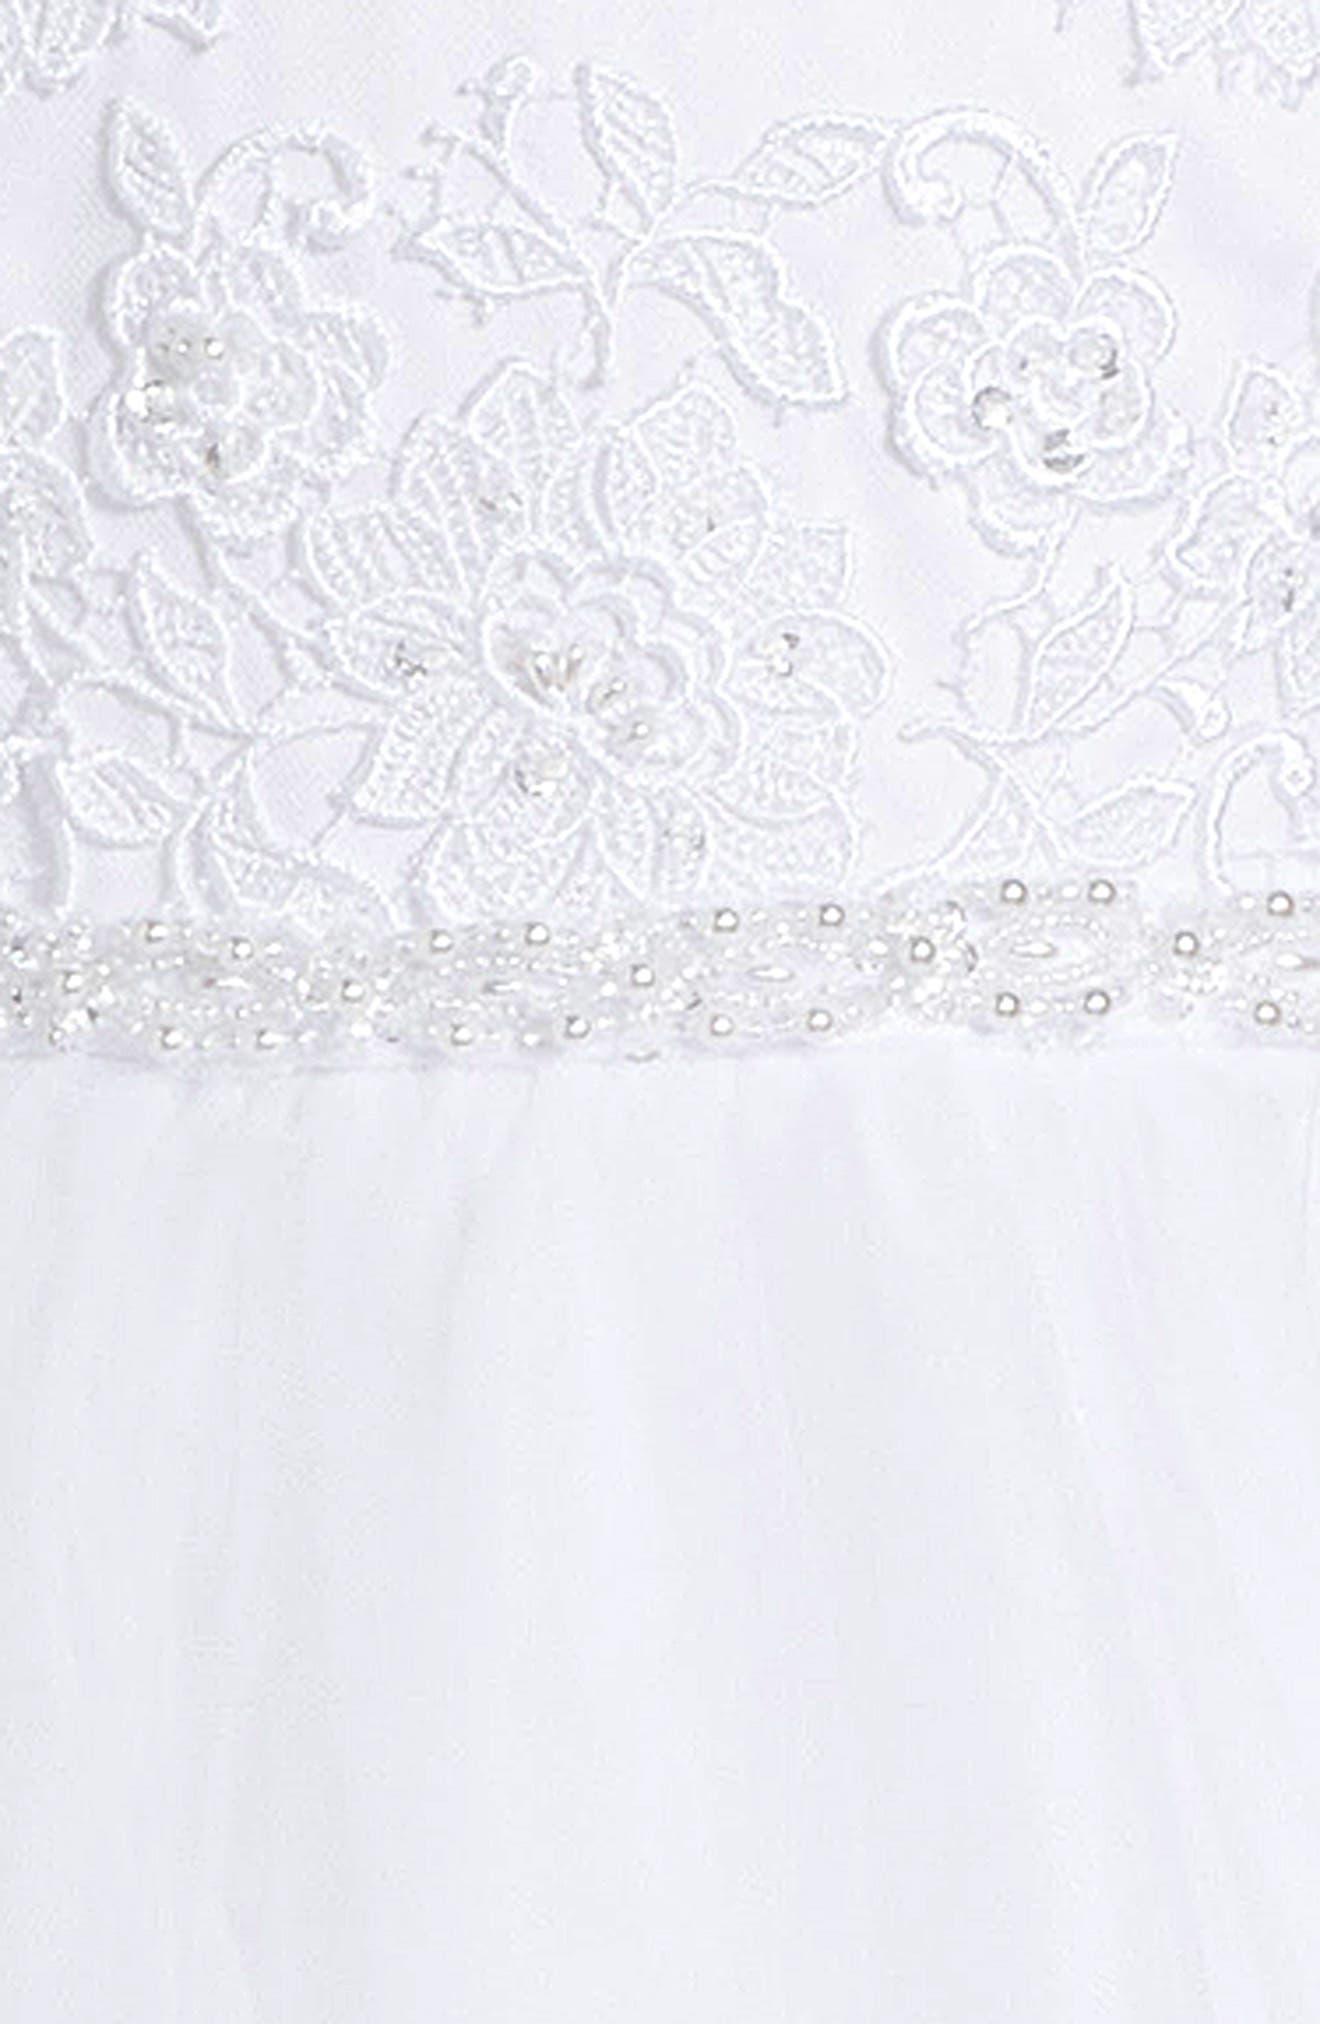 Alternate Image 3  - Joan Calabrese for Mon Cheri Floral Appliqué First Communion Dress (Little Girls & Big Girls)